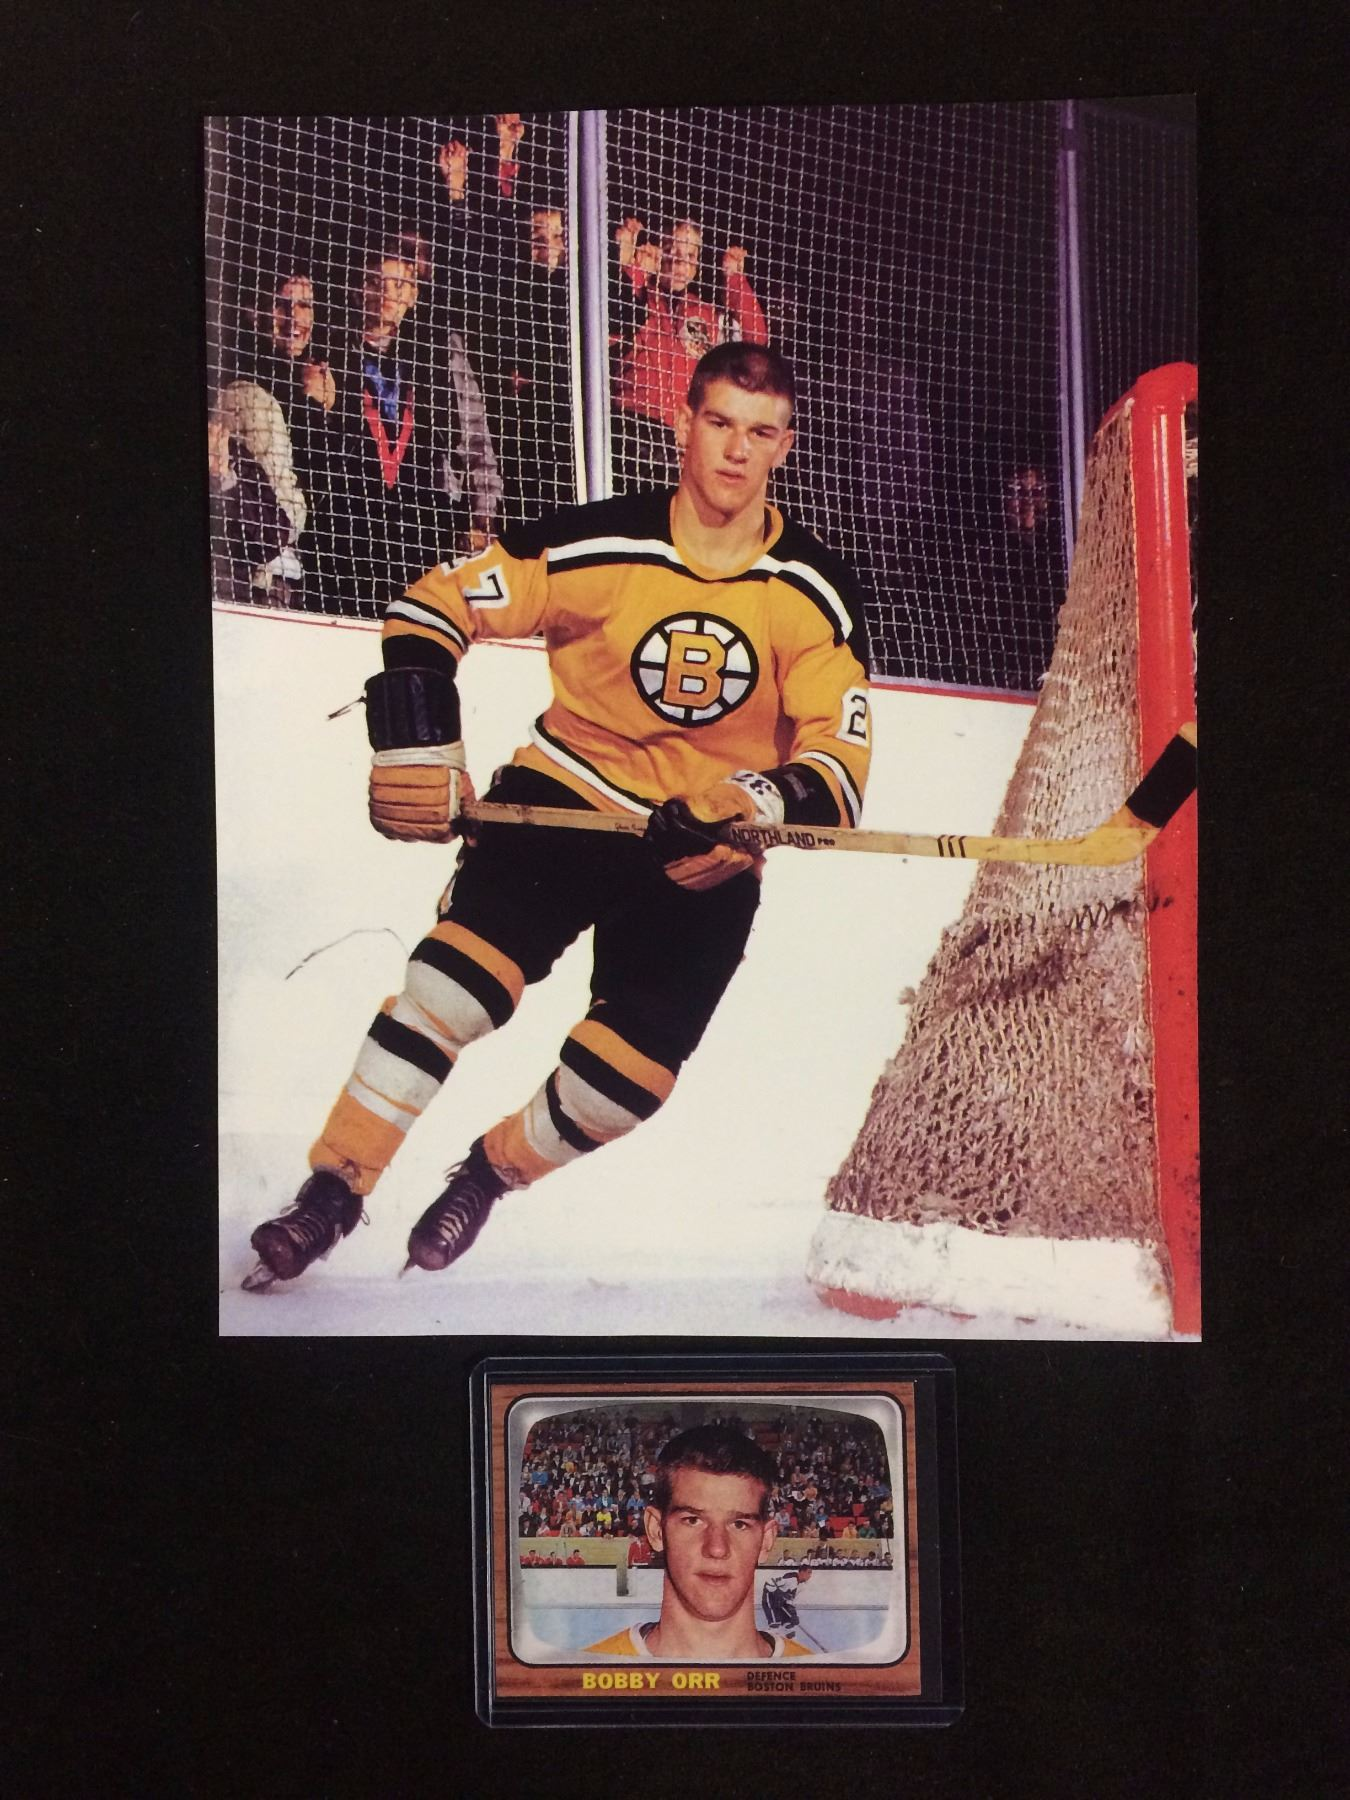 Bobby Orr 8 X 10 Photo With Bobby Orr Rookie Card Reprint